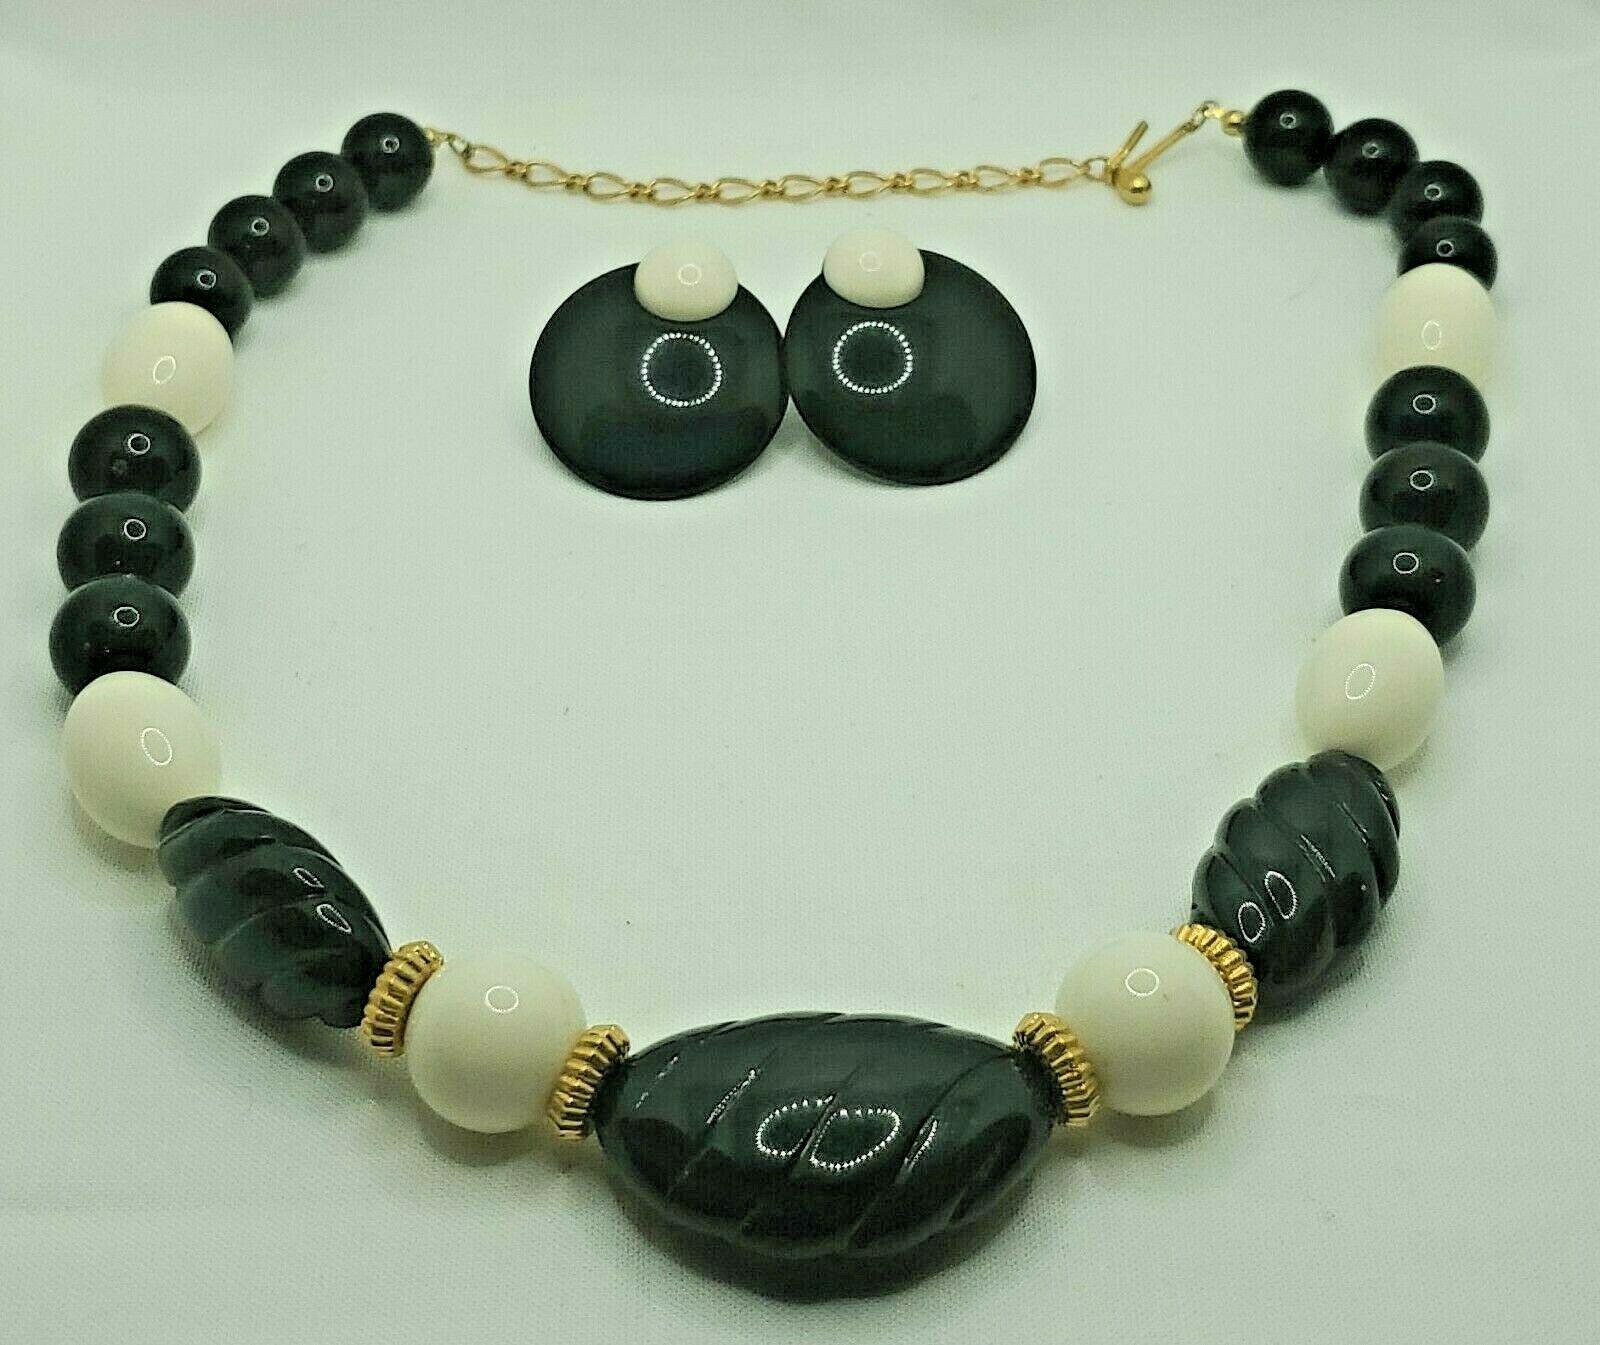 "Fashion Jewelry Black Cream Bead Gold-tone 17"" Necklace & Pierced Earrings Set - $14.24"